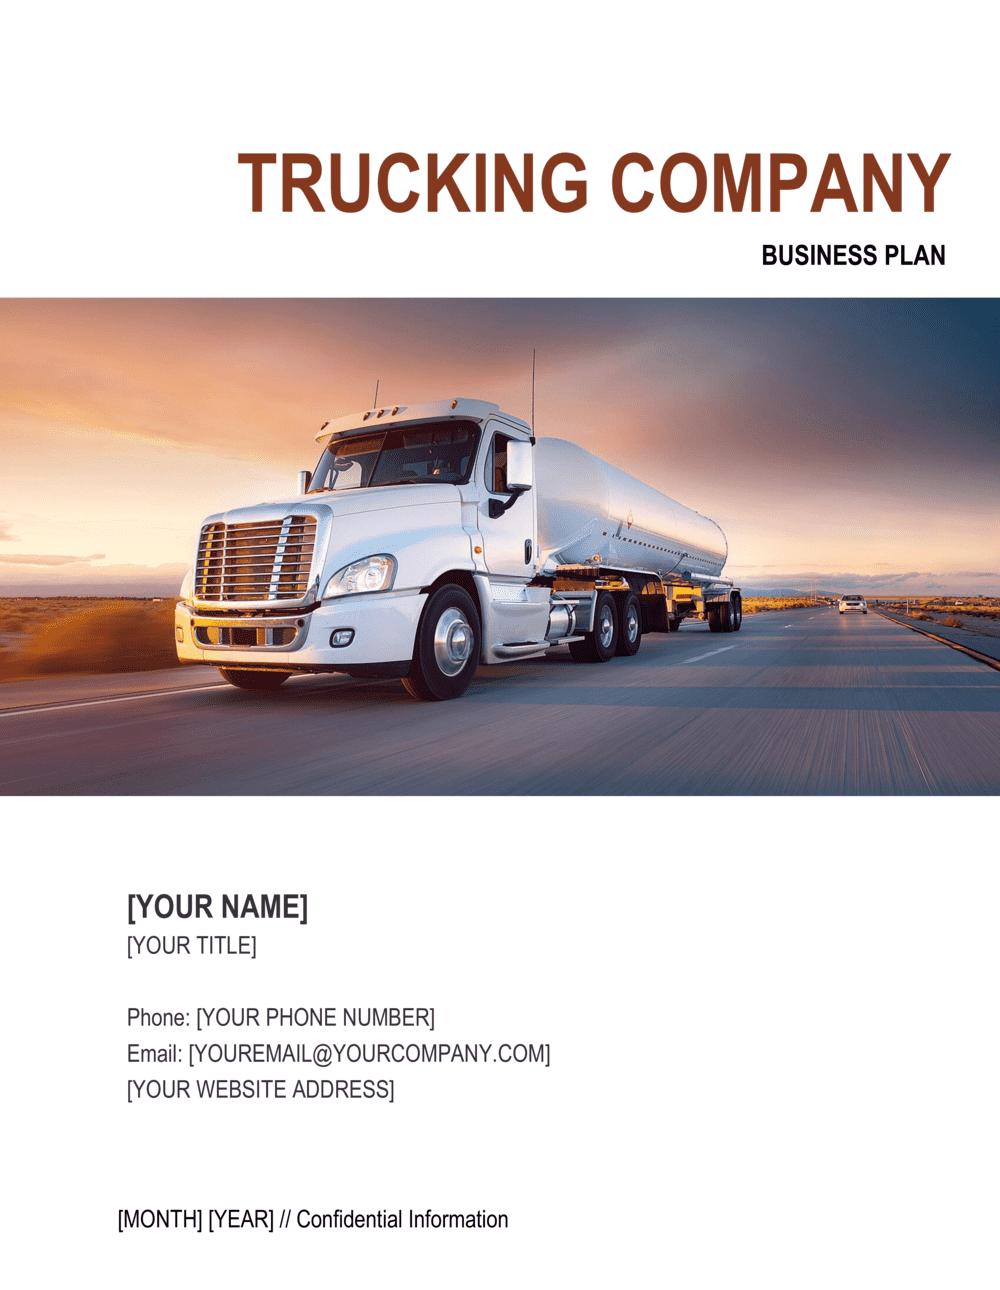 Trucking Company Business Plan 2